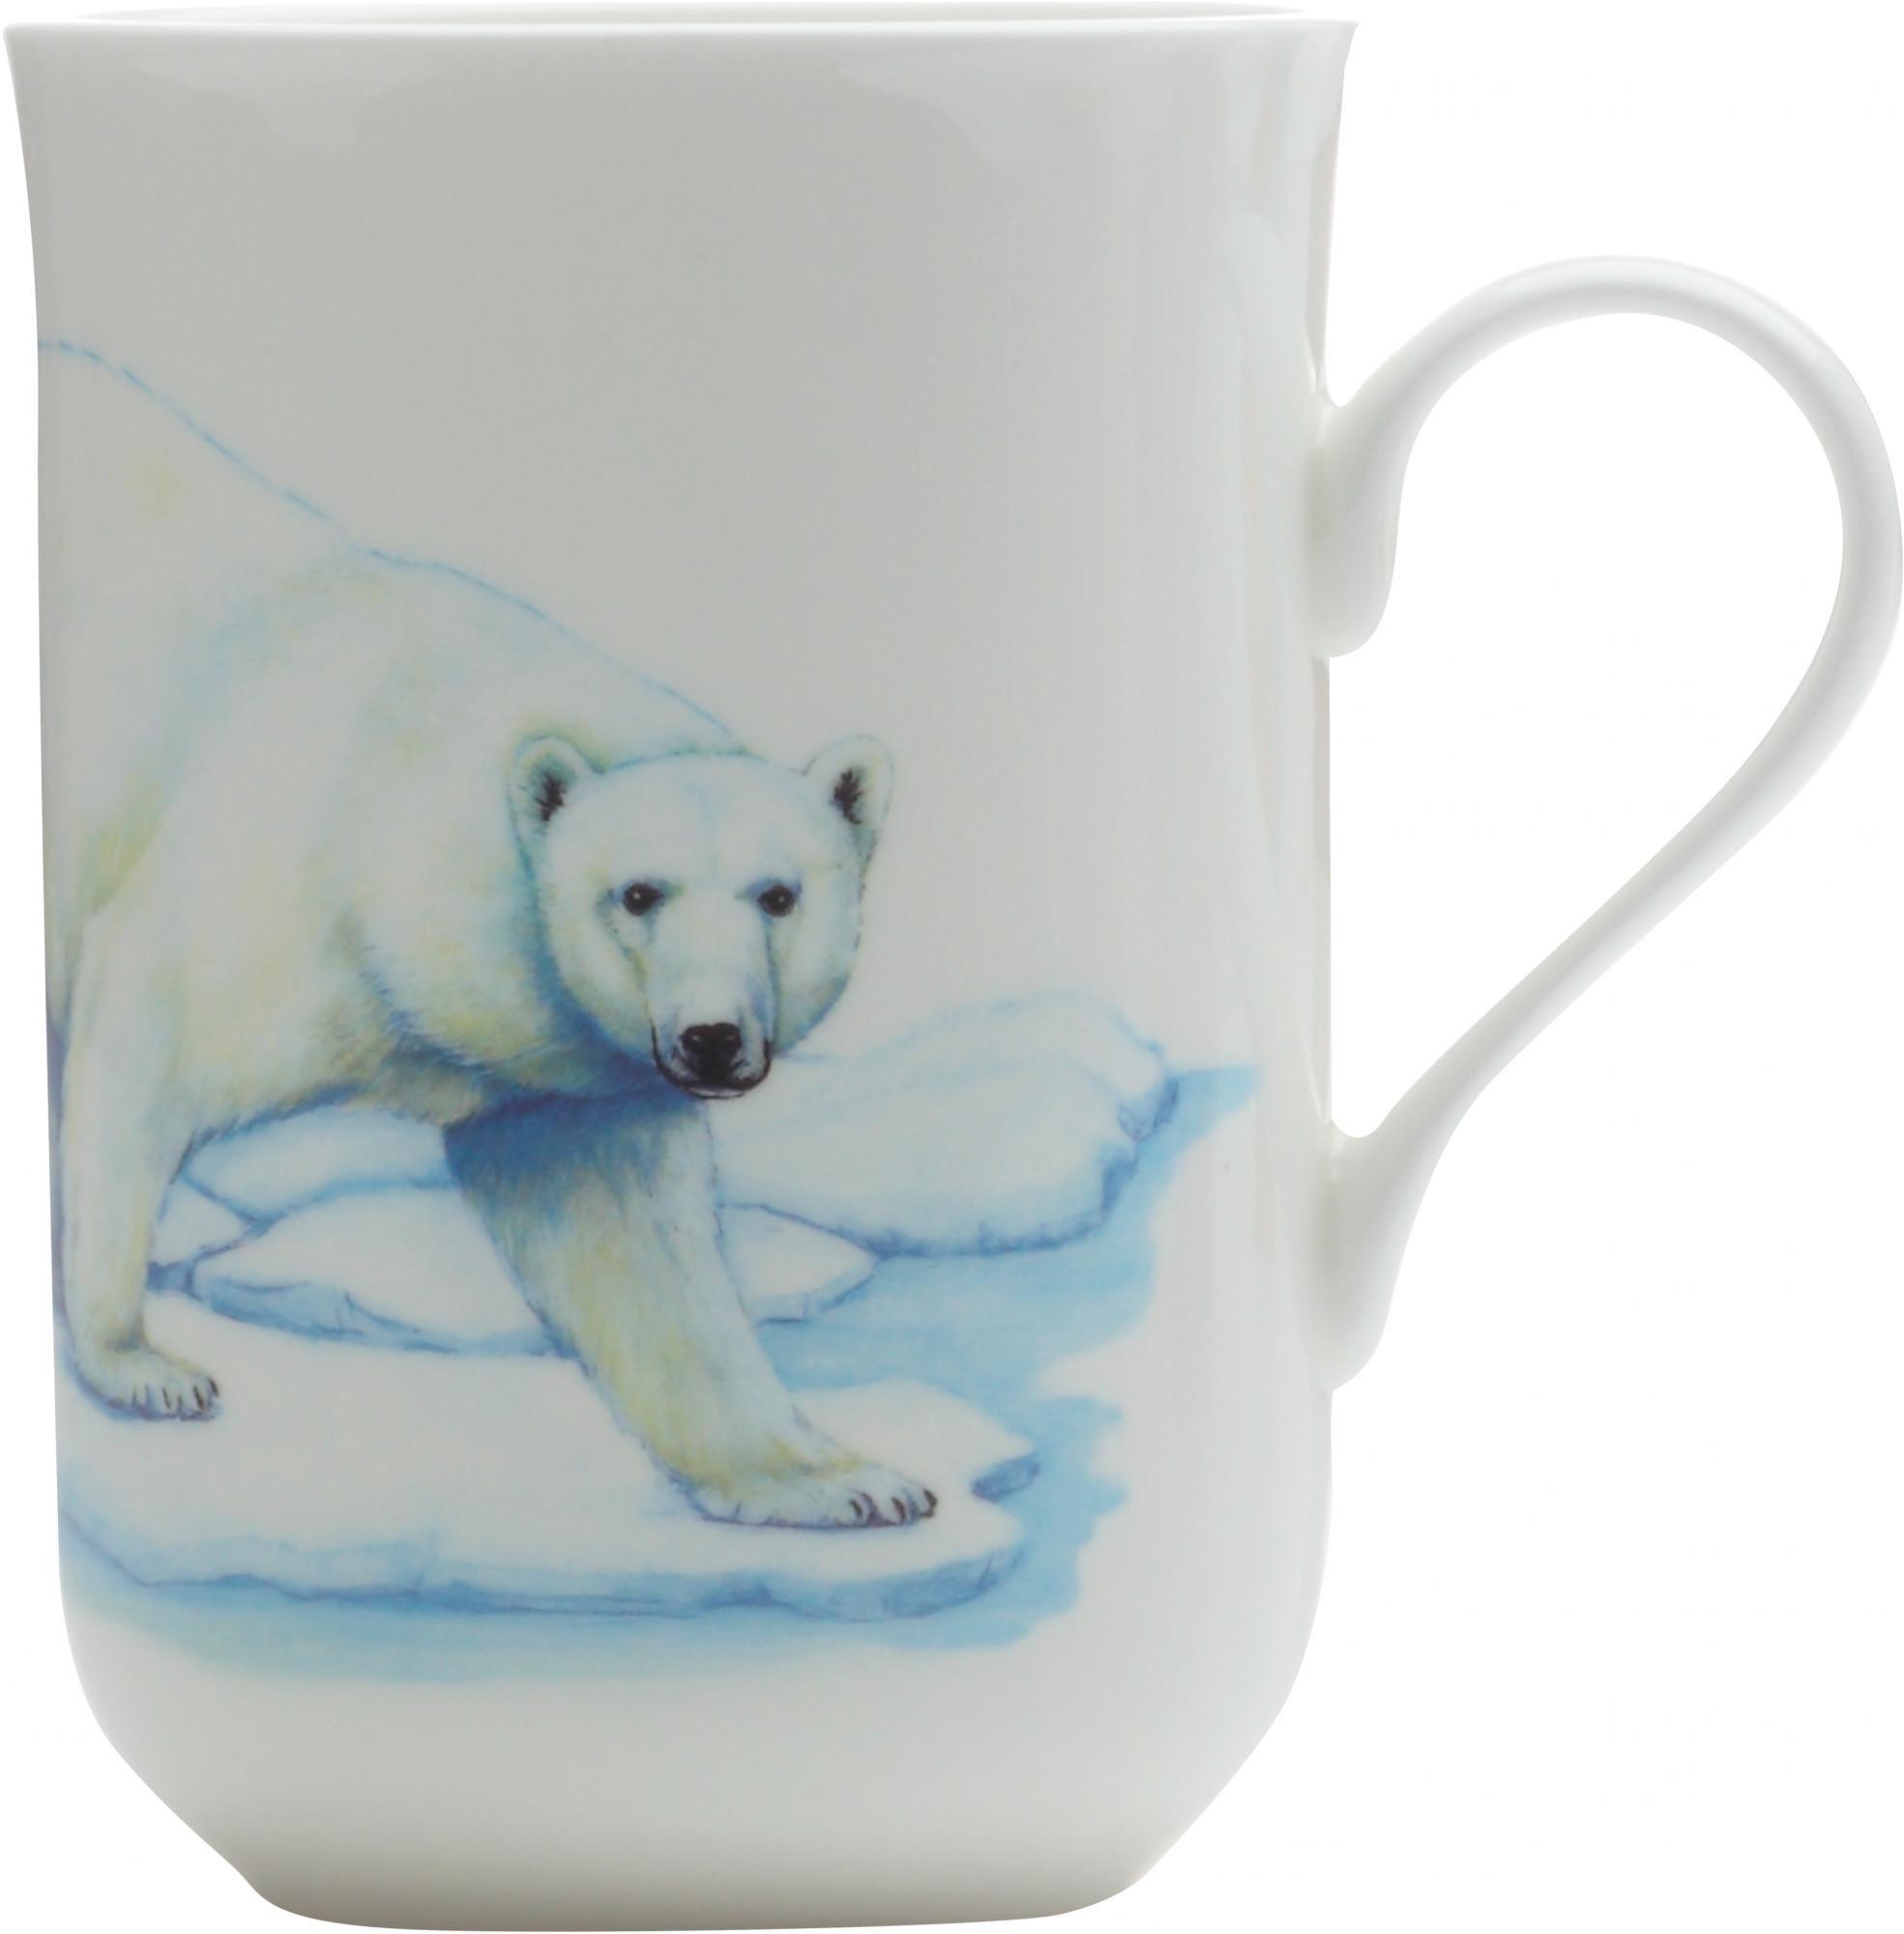 Hrnek 300 ml, Lední medvěd, Animals of the world - Maxwell&Williams